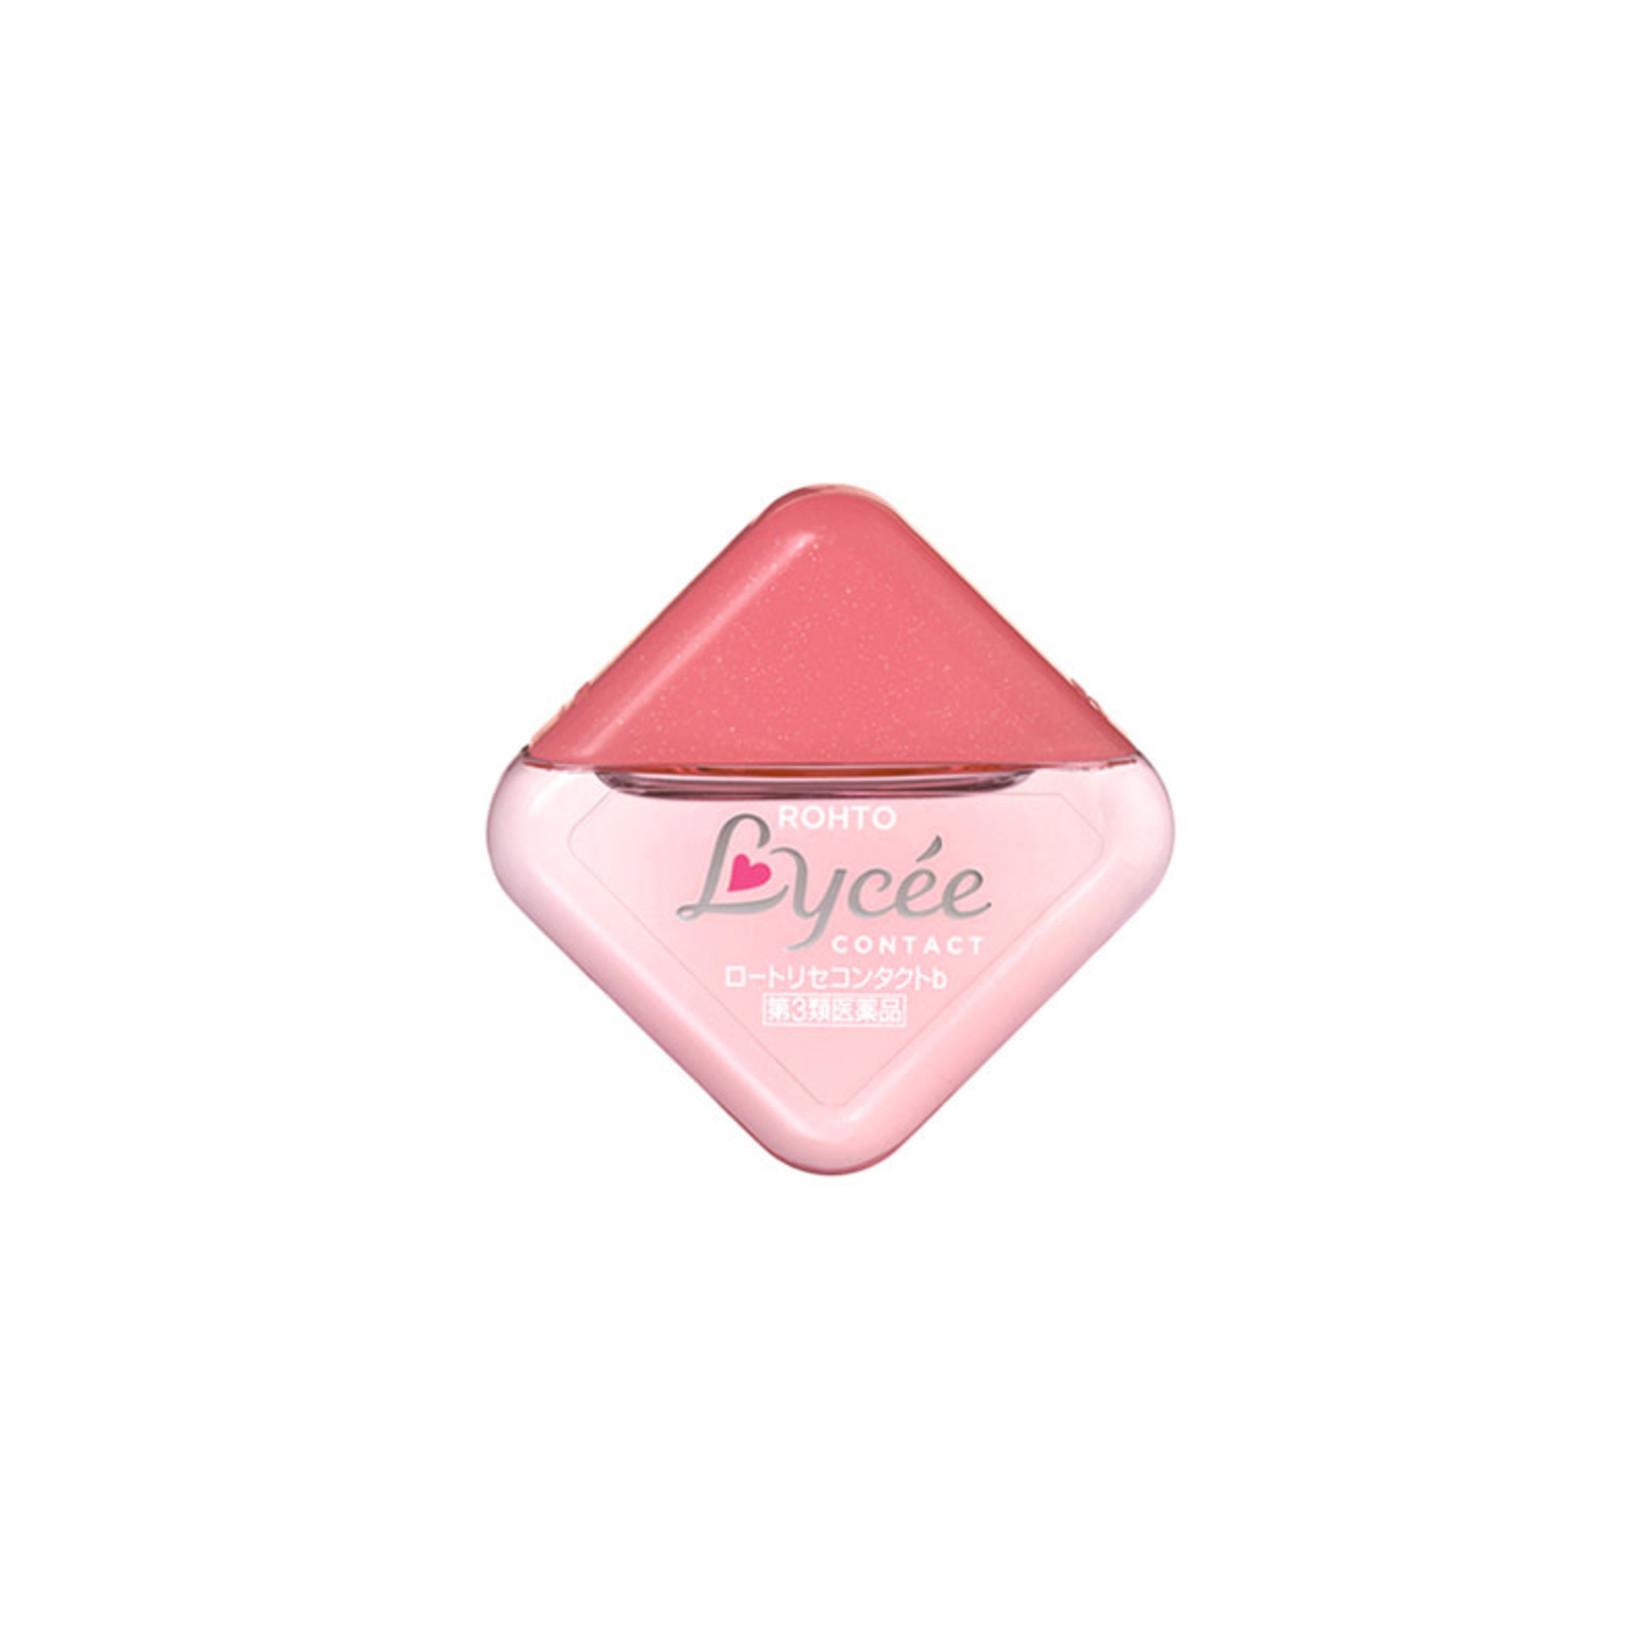 Rohto Lycee Eye Drops - Contact Lens